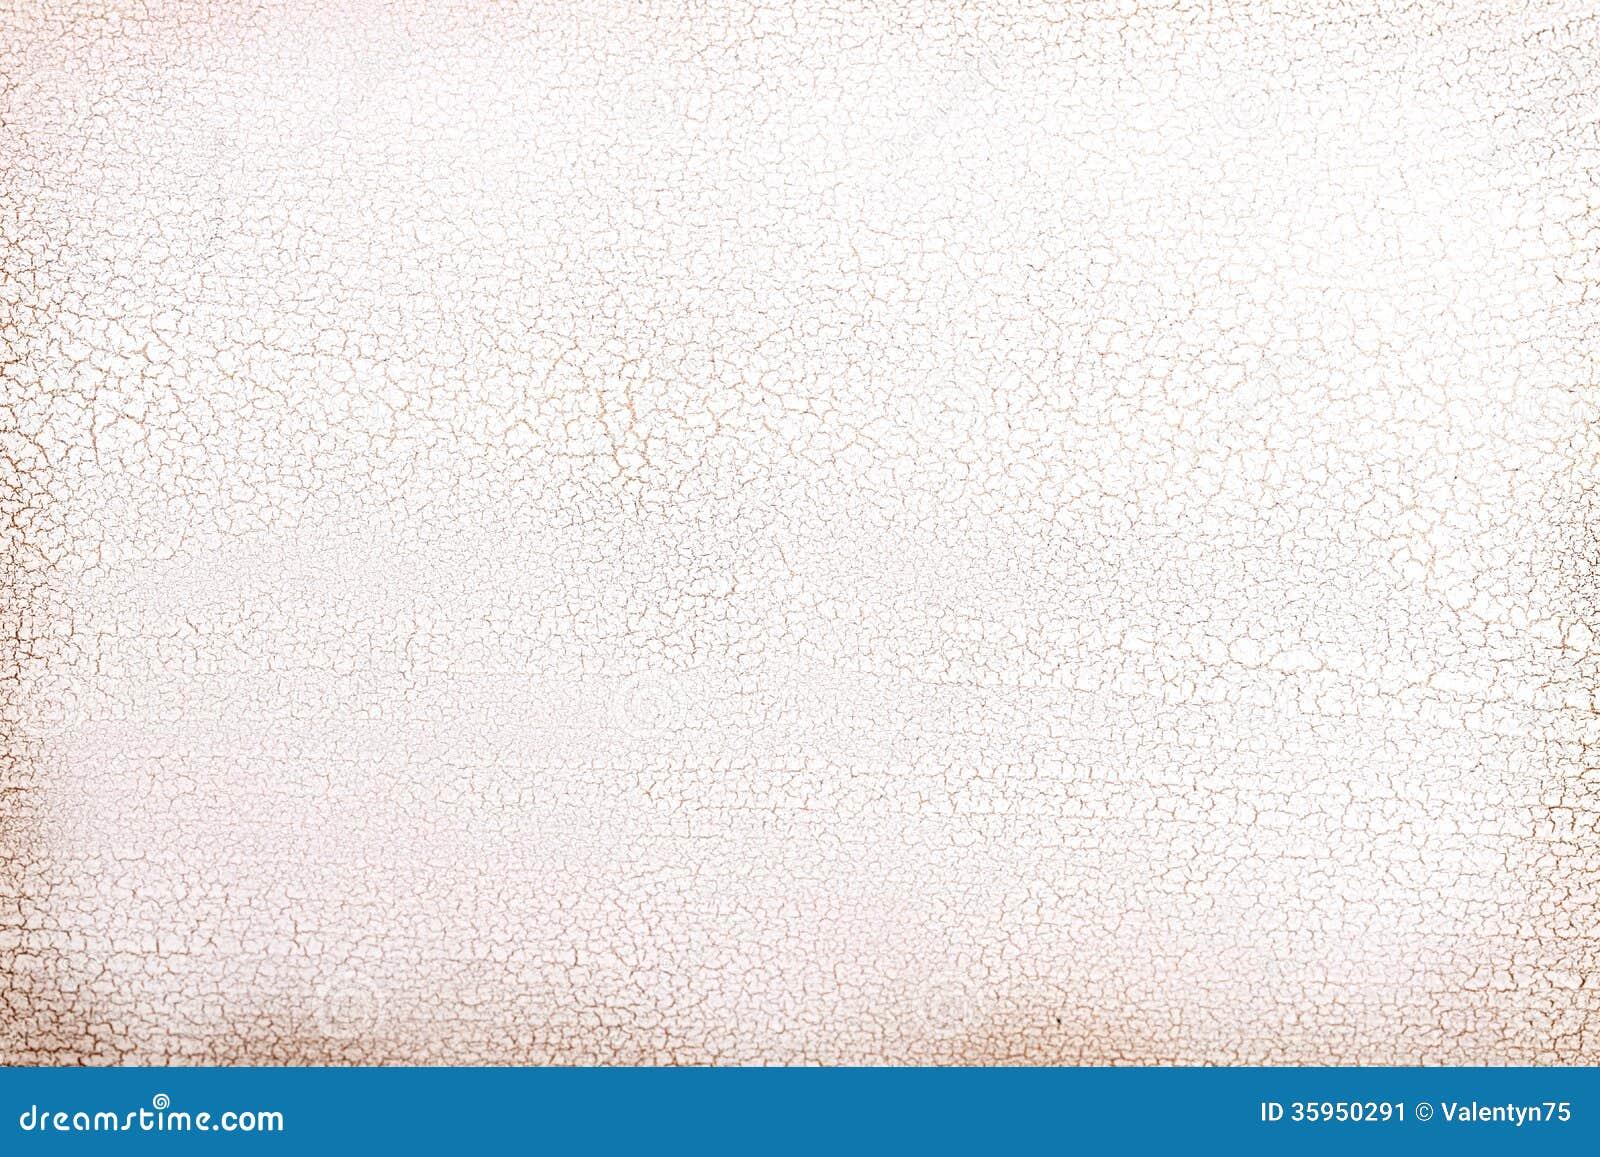 Resquebrajadura superficial de madera blanca.